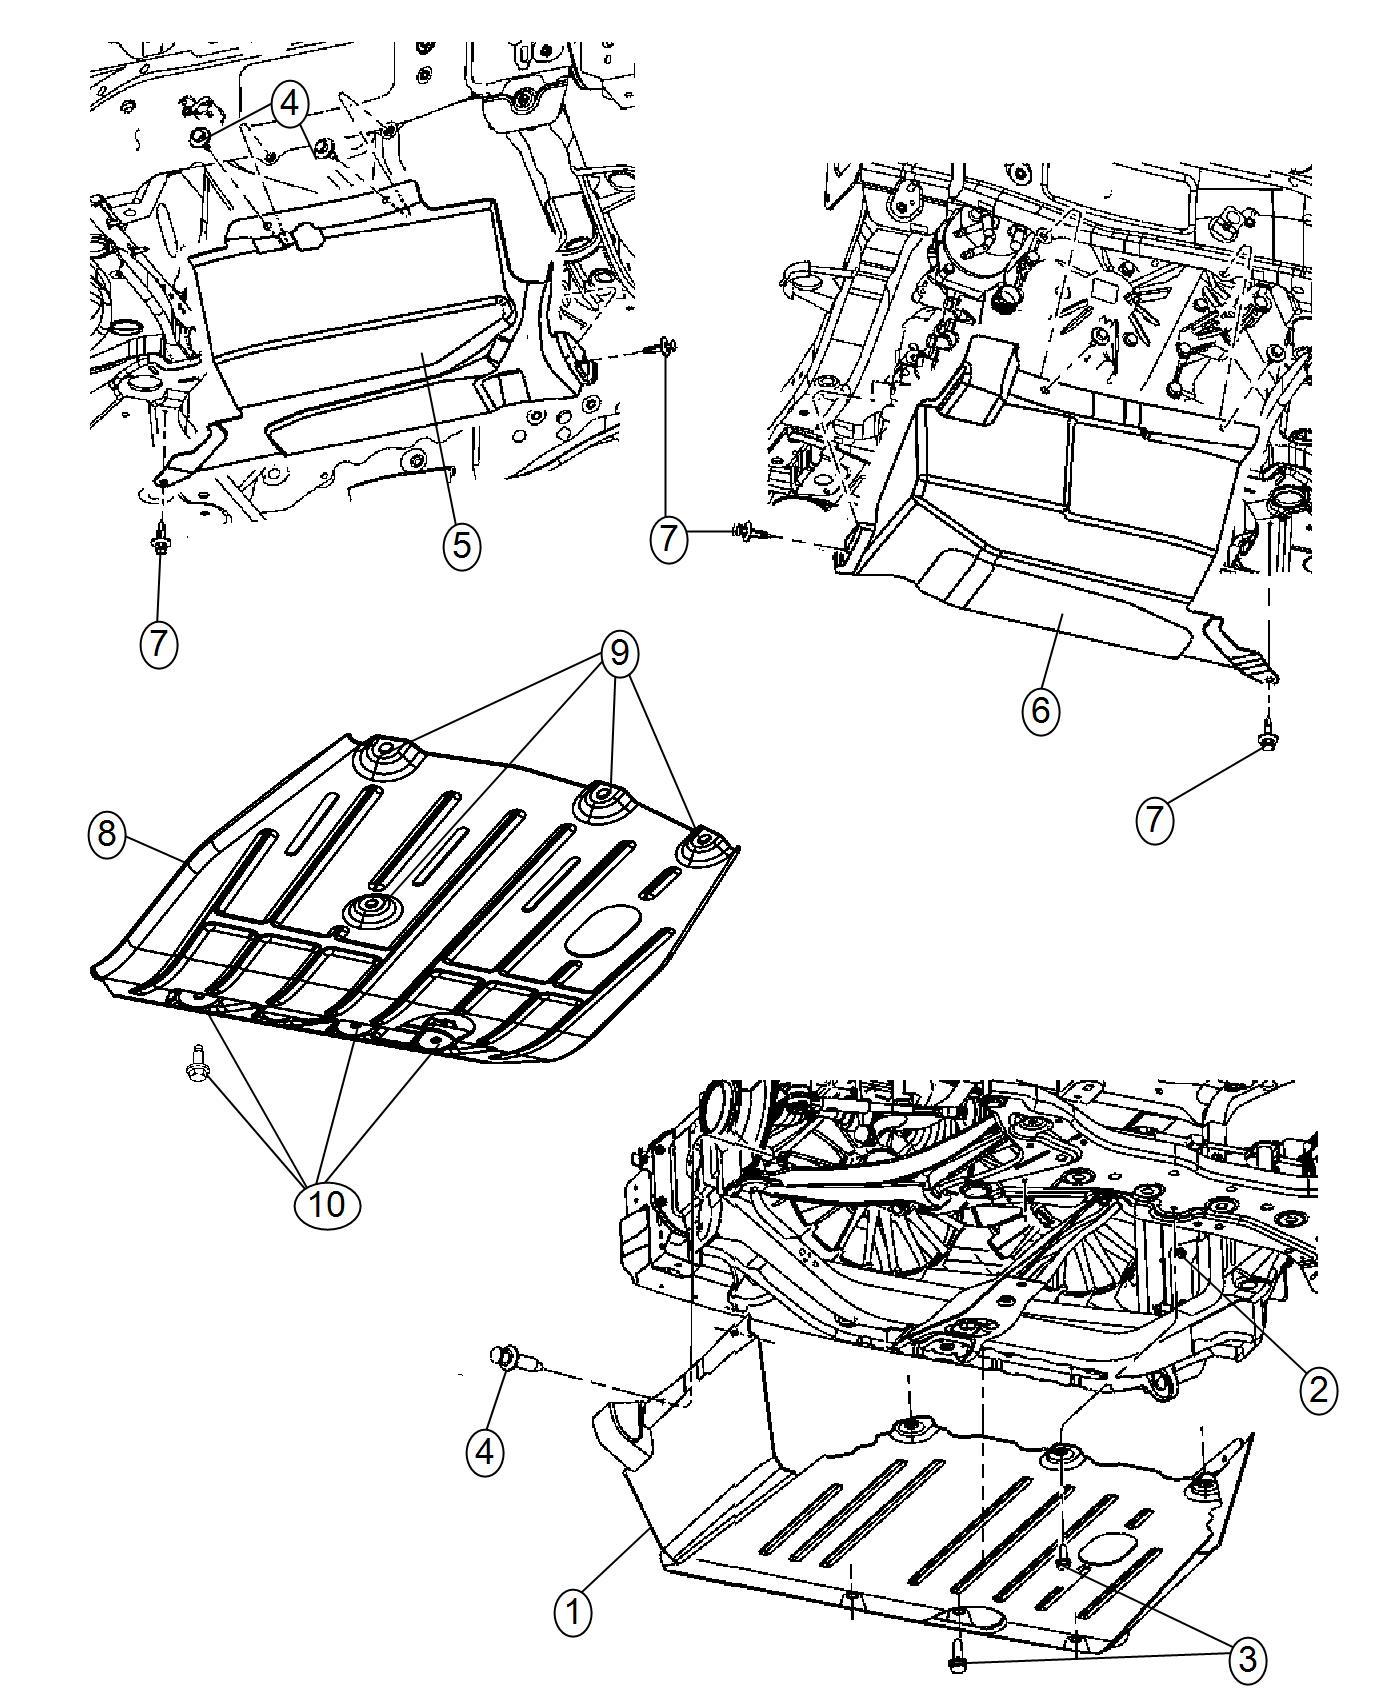 Jeep Patriot Bracket Skid Plate Awl Body